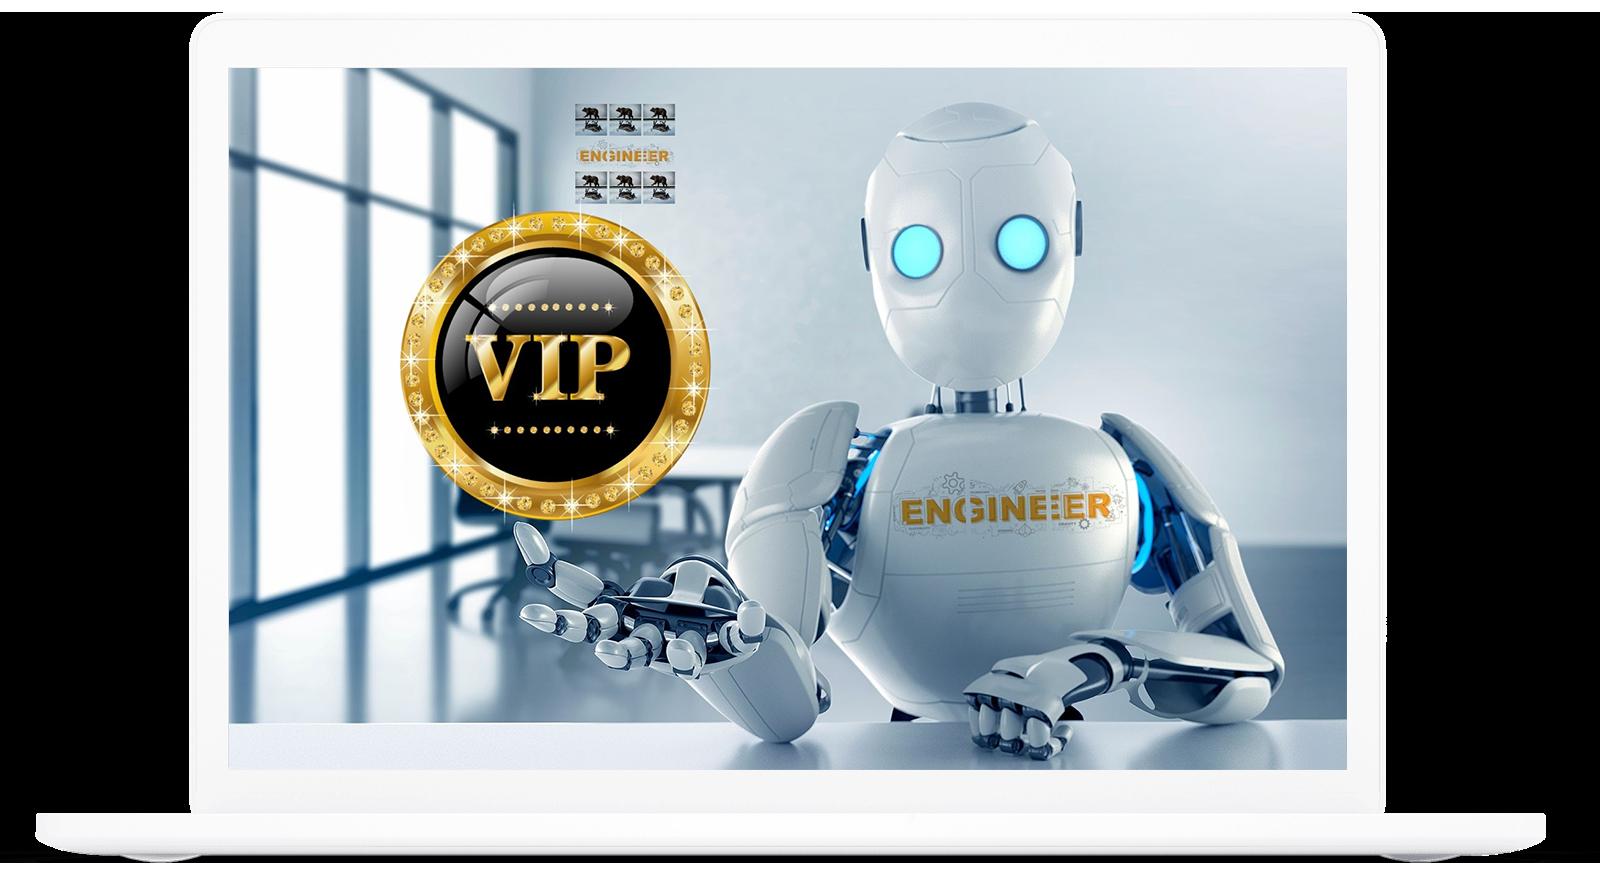 VIP Robot on a laptop